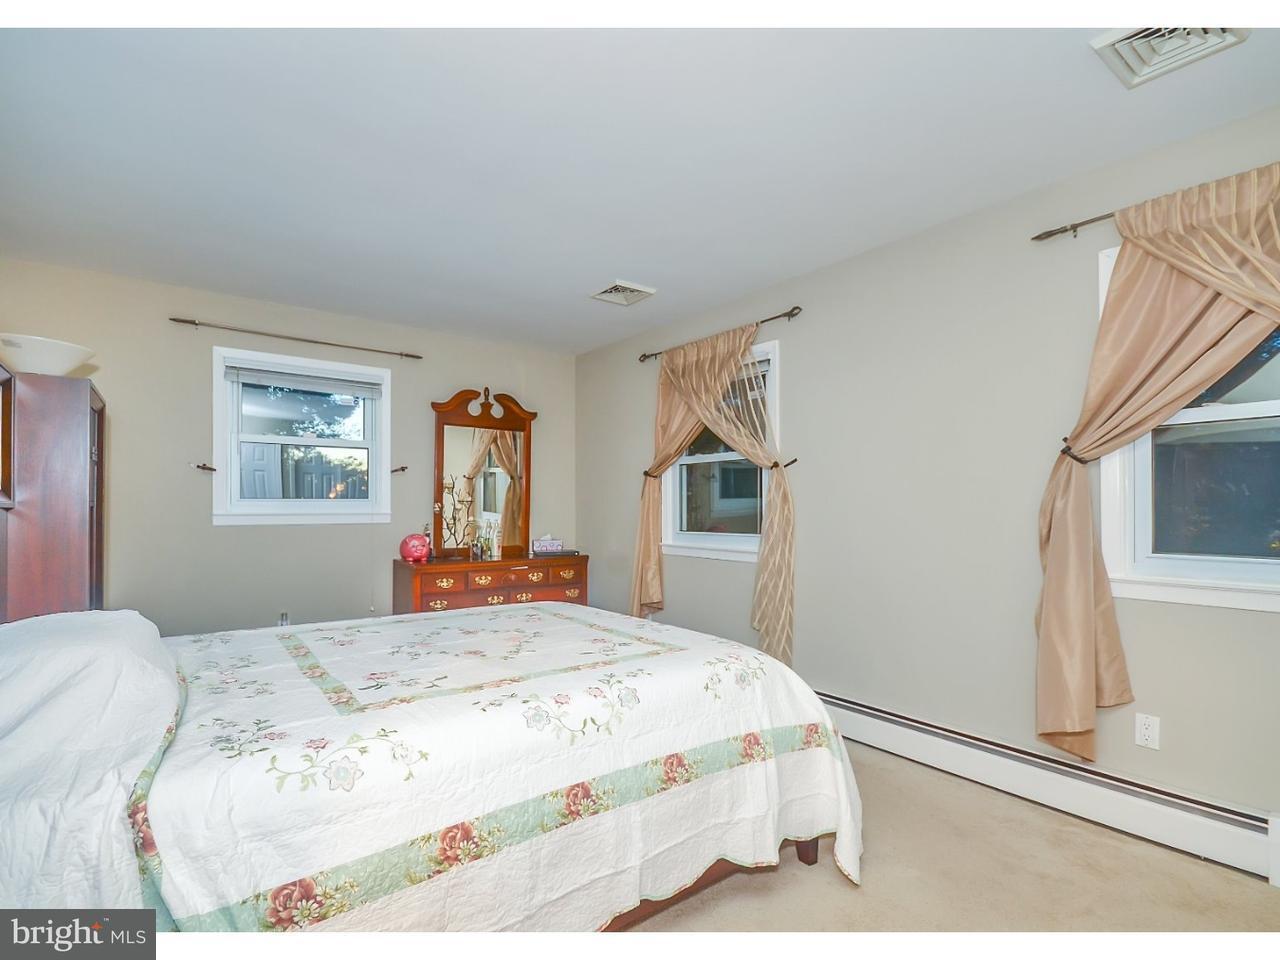 Casa Unifamiliar por un Alquiler en 426 PLAINSBORO Road Plainsboro, Nueva Jersey 08536 Estados UnidosEn/Alrededor: Plainsboro Township